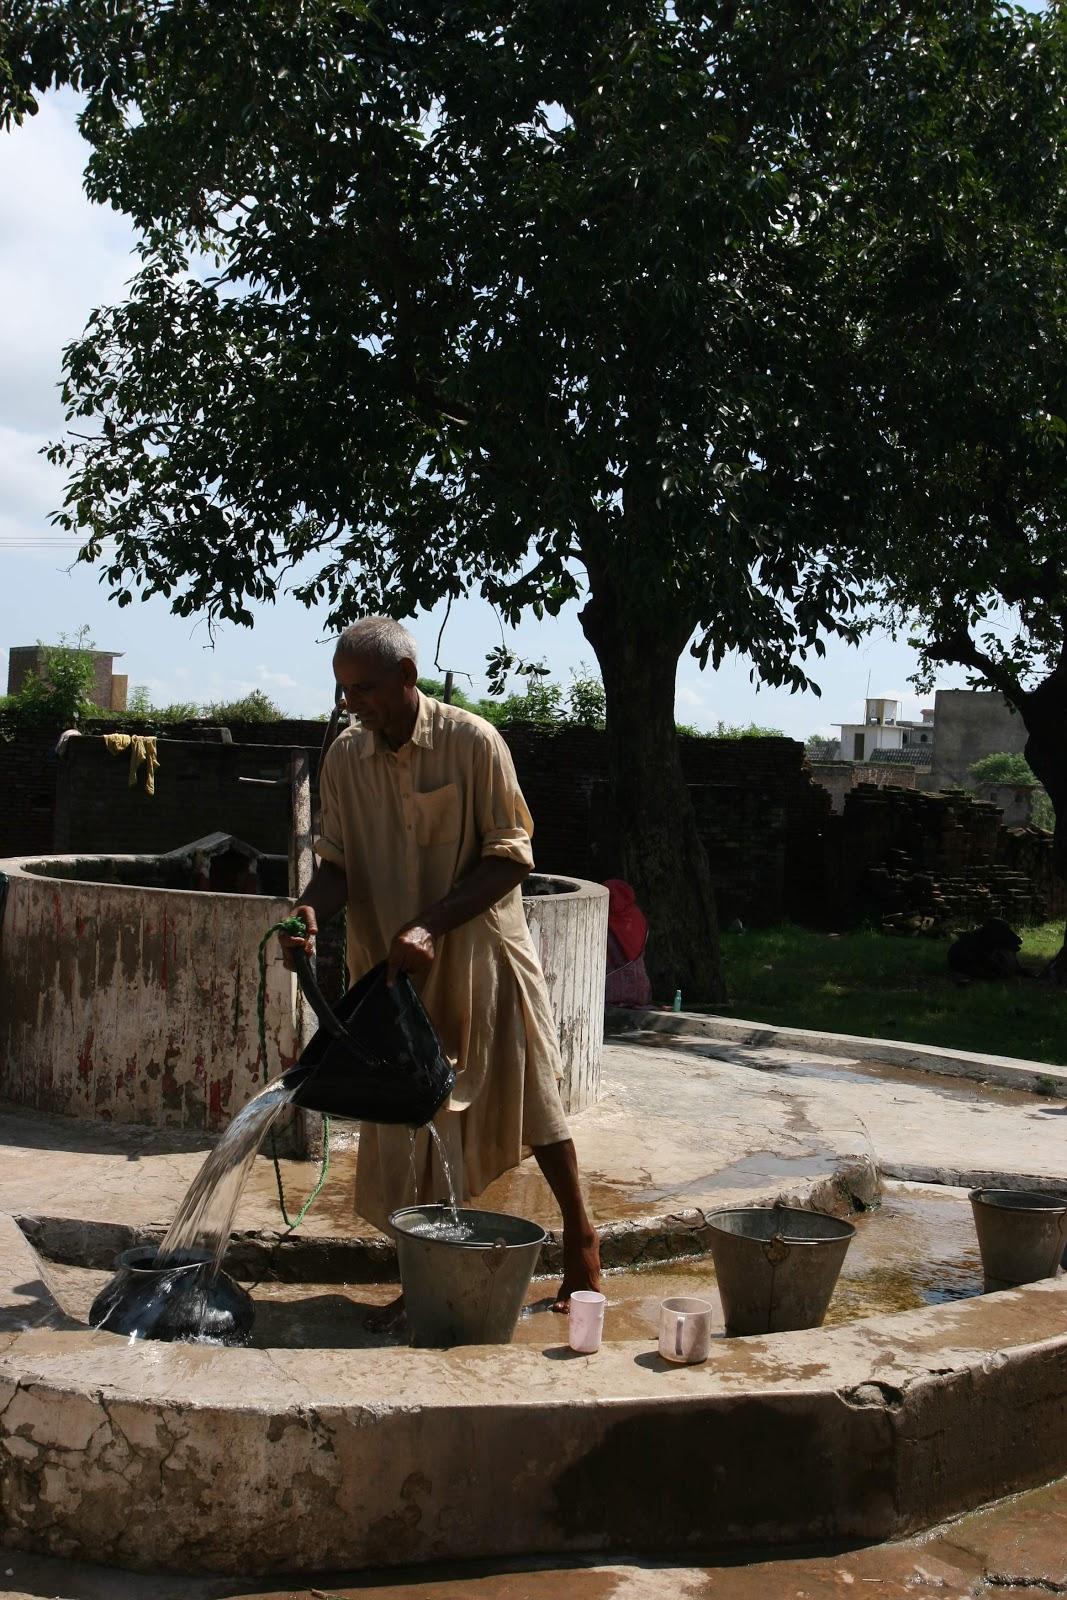 puran bhagat Directed by debaki bose with choudhury mohammed rafiq, m kumar, anwari, krishna chandra dey the legend of prince puran, born under king silwan of sialkot's curse which binds his parents.